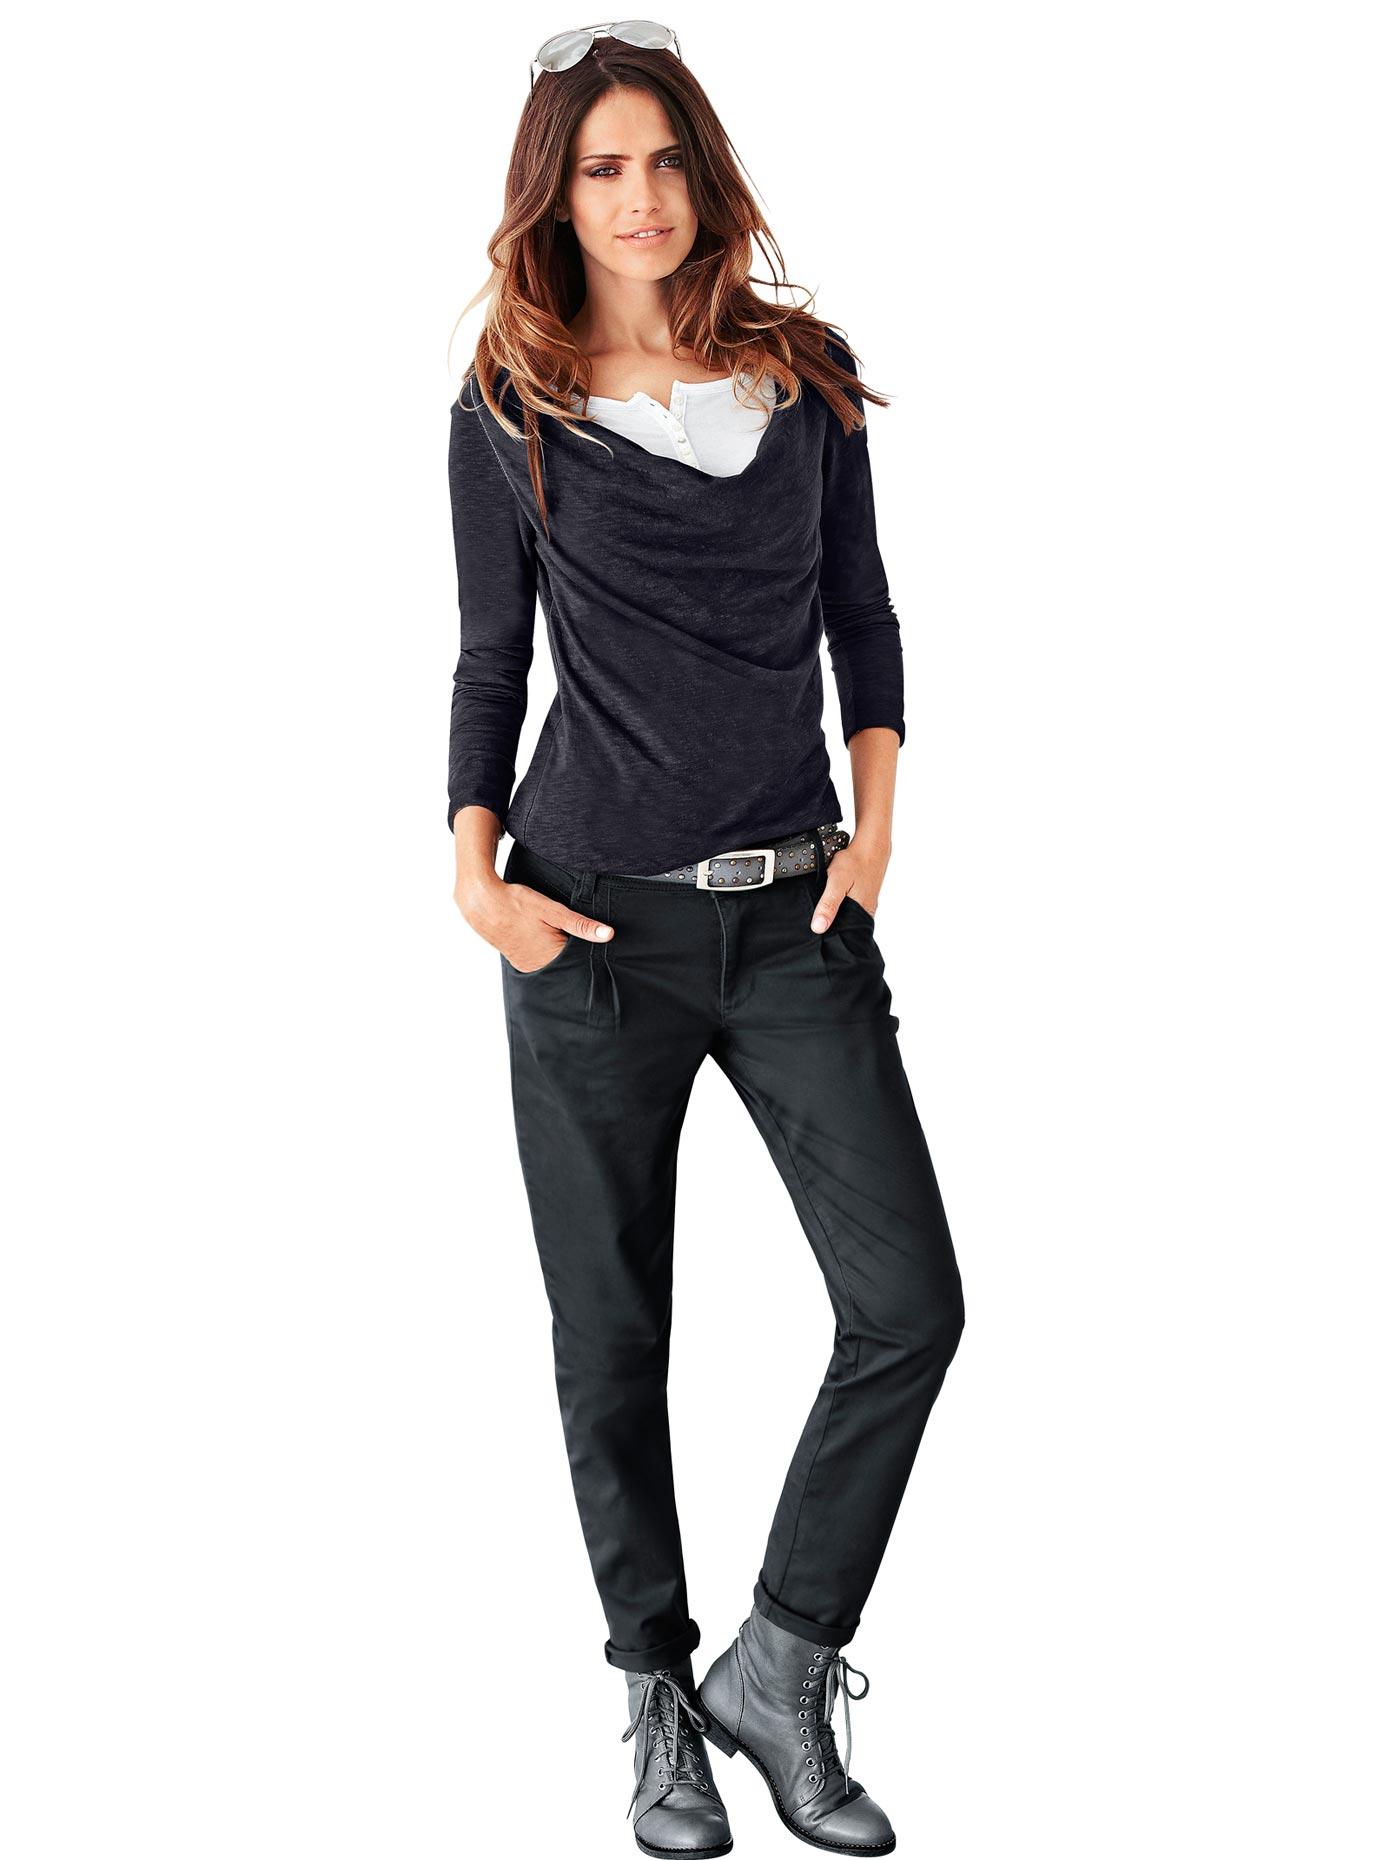 Classic Inspirationen 2-in-1-Shirt | Bekleidung > Shirts > 2-in-1 Shirts | Schwarz | CLASSIC INSPIRATIONEN